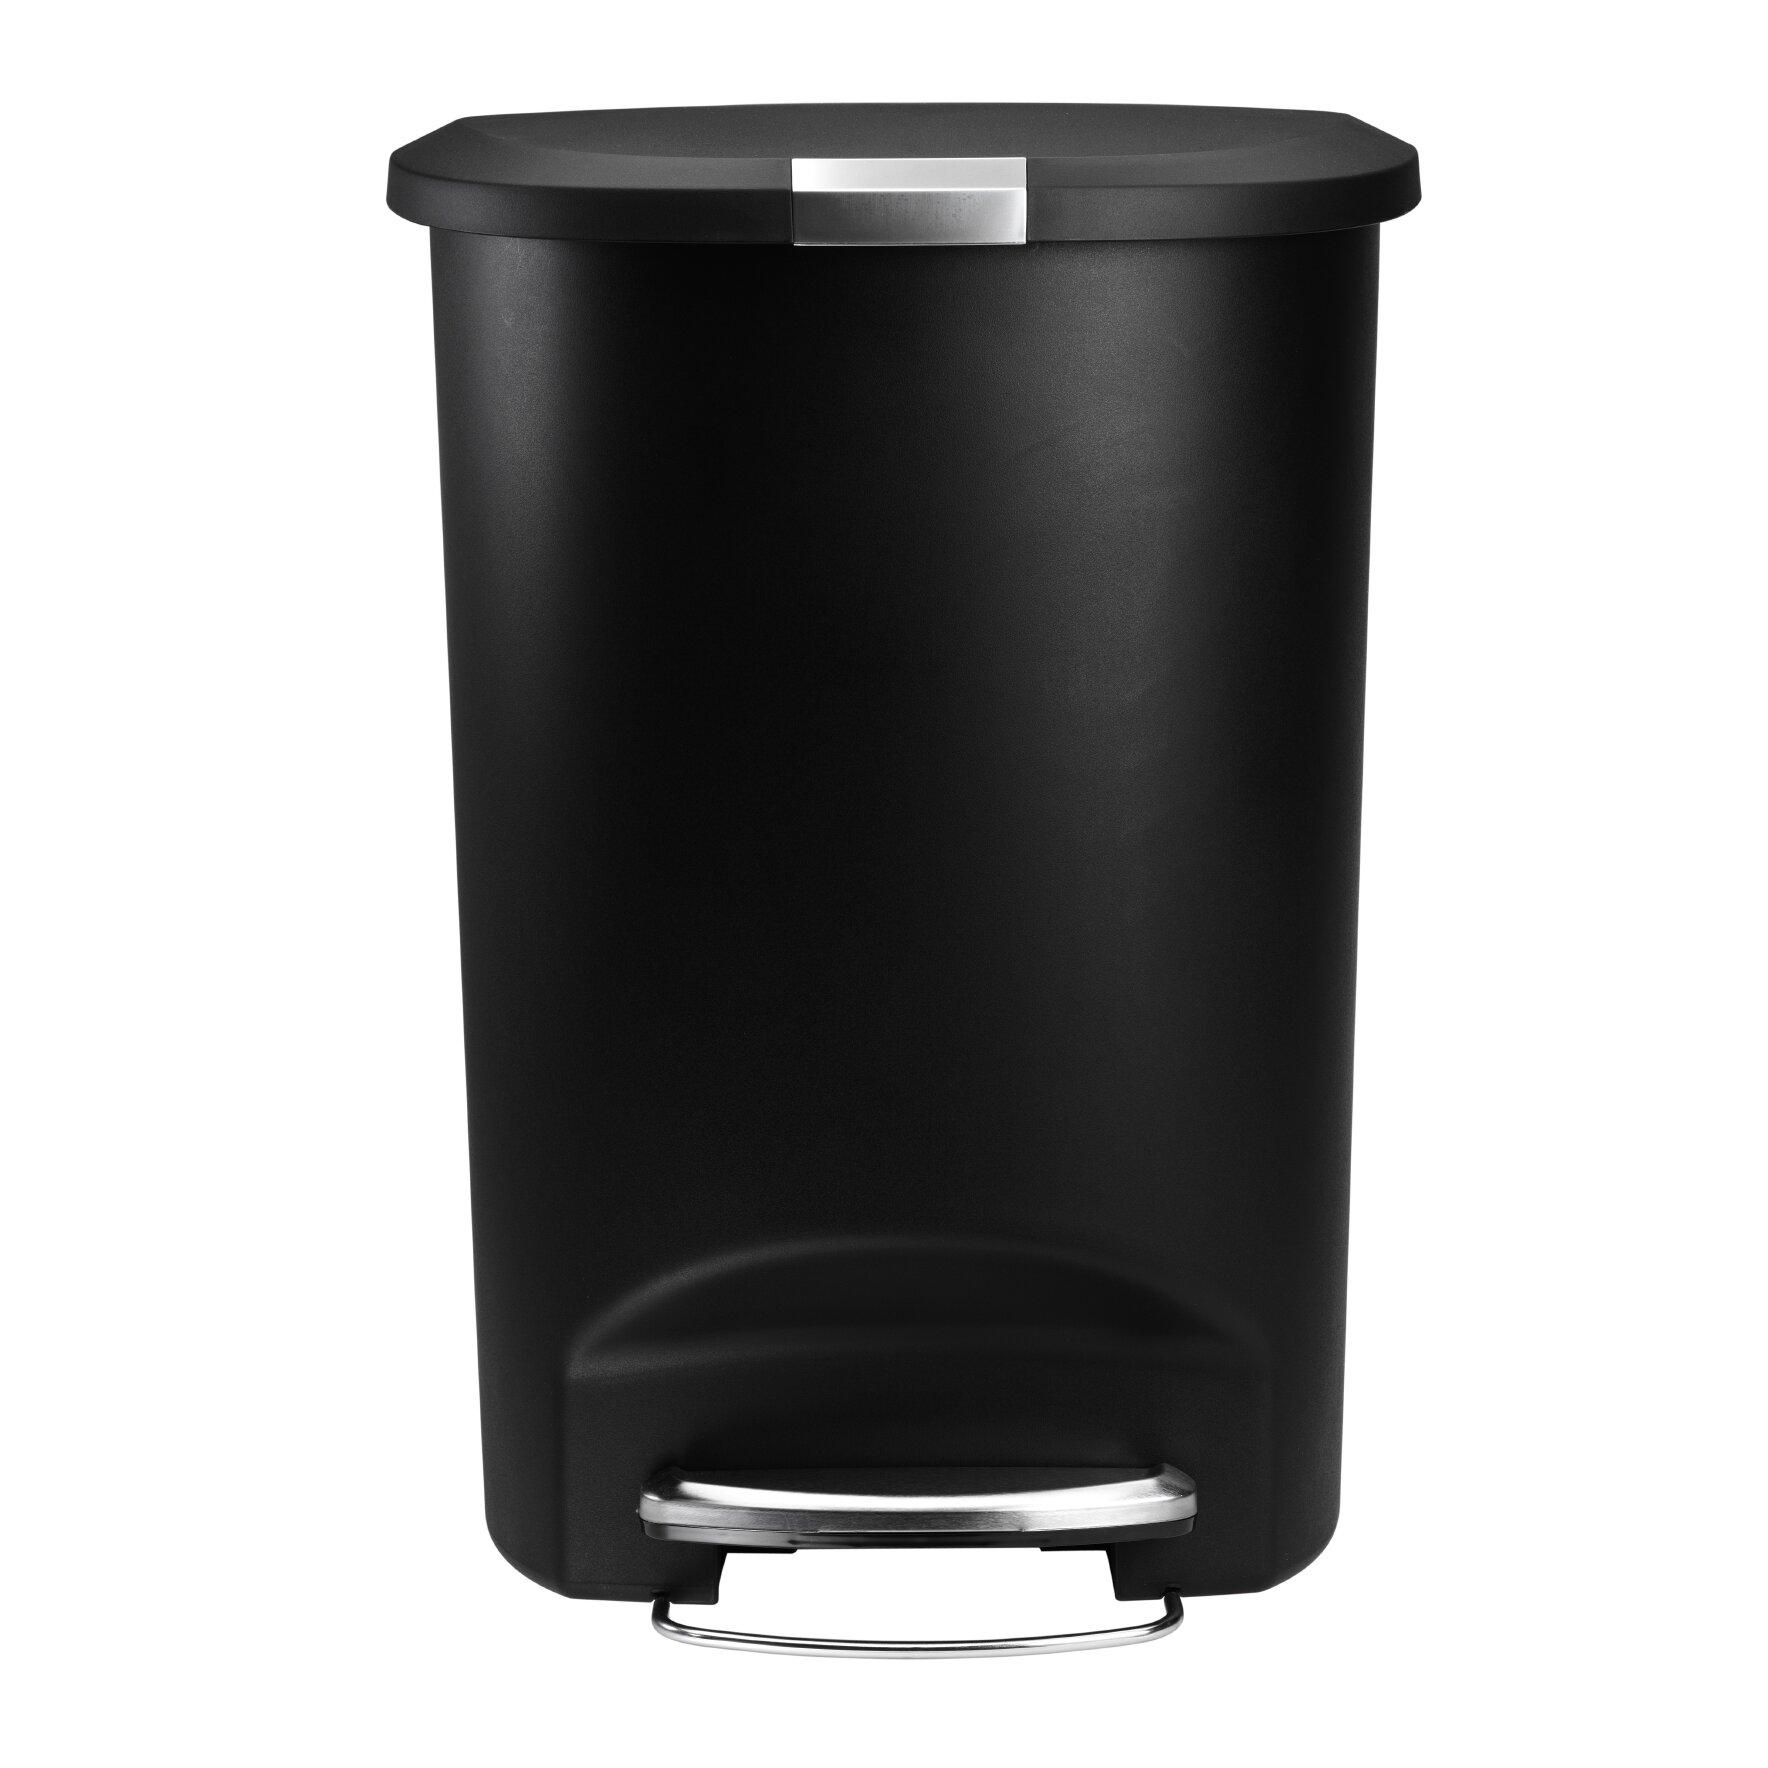 simplehuman 13 gallon step-on trash can & reviews   wayfair